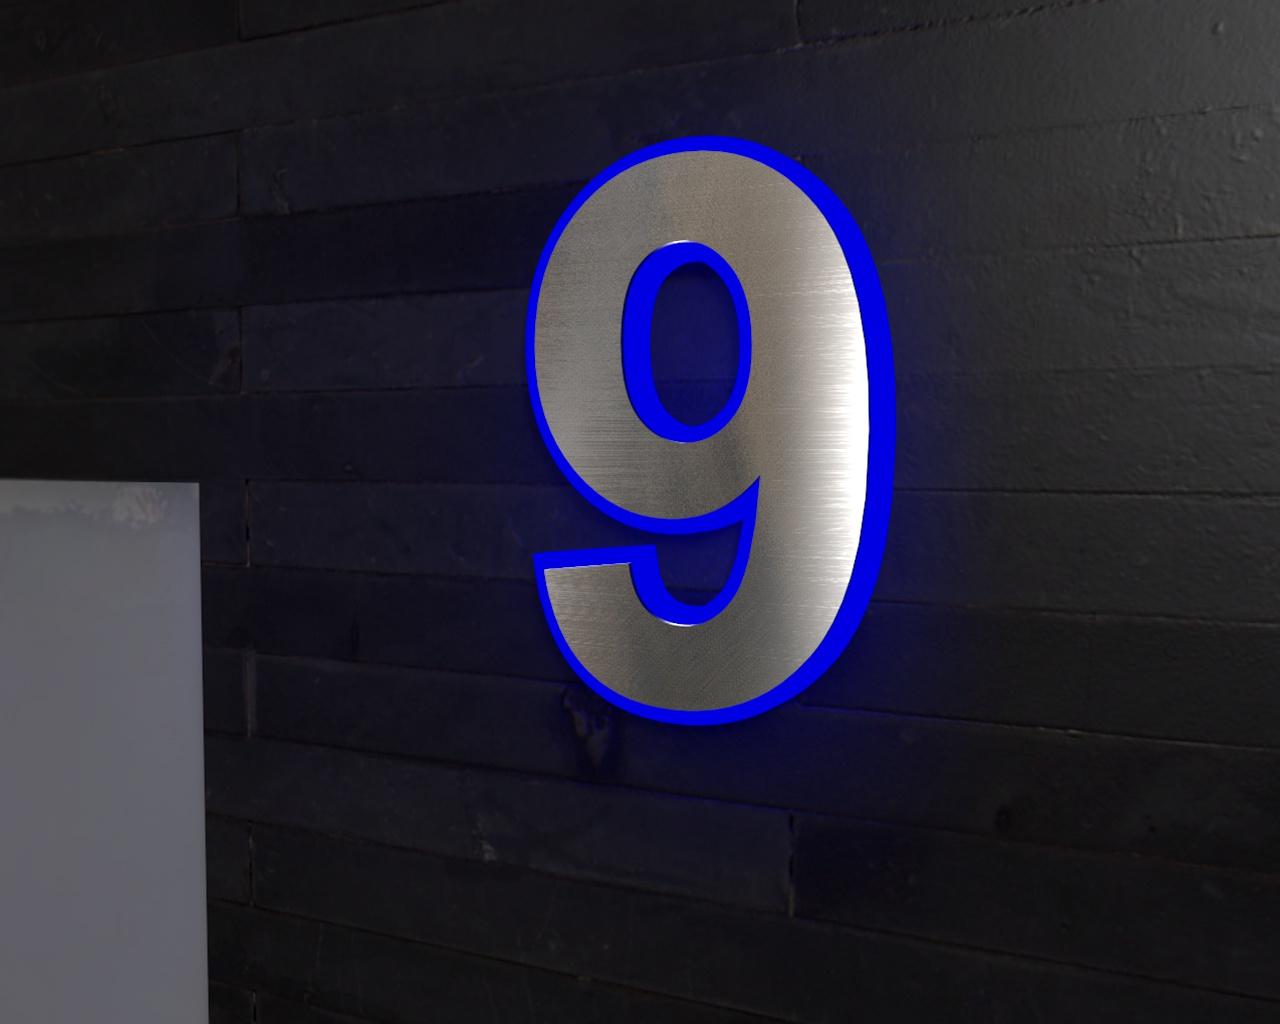 edelstahl hausnummer beleuchtete led edelstahl hausnummer 9. Black Bedroom Furniture Sets. Home Design Ideas